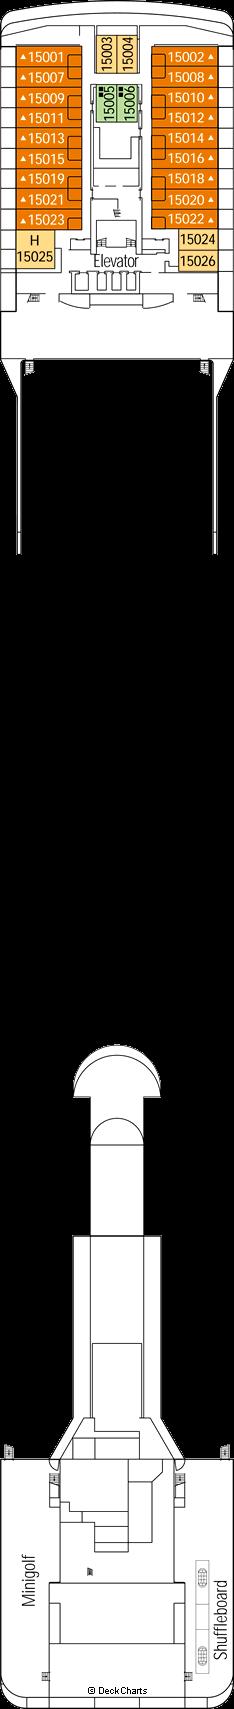 MSC Orchestra: Xilofono Deck